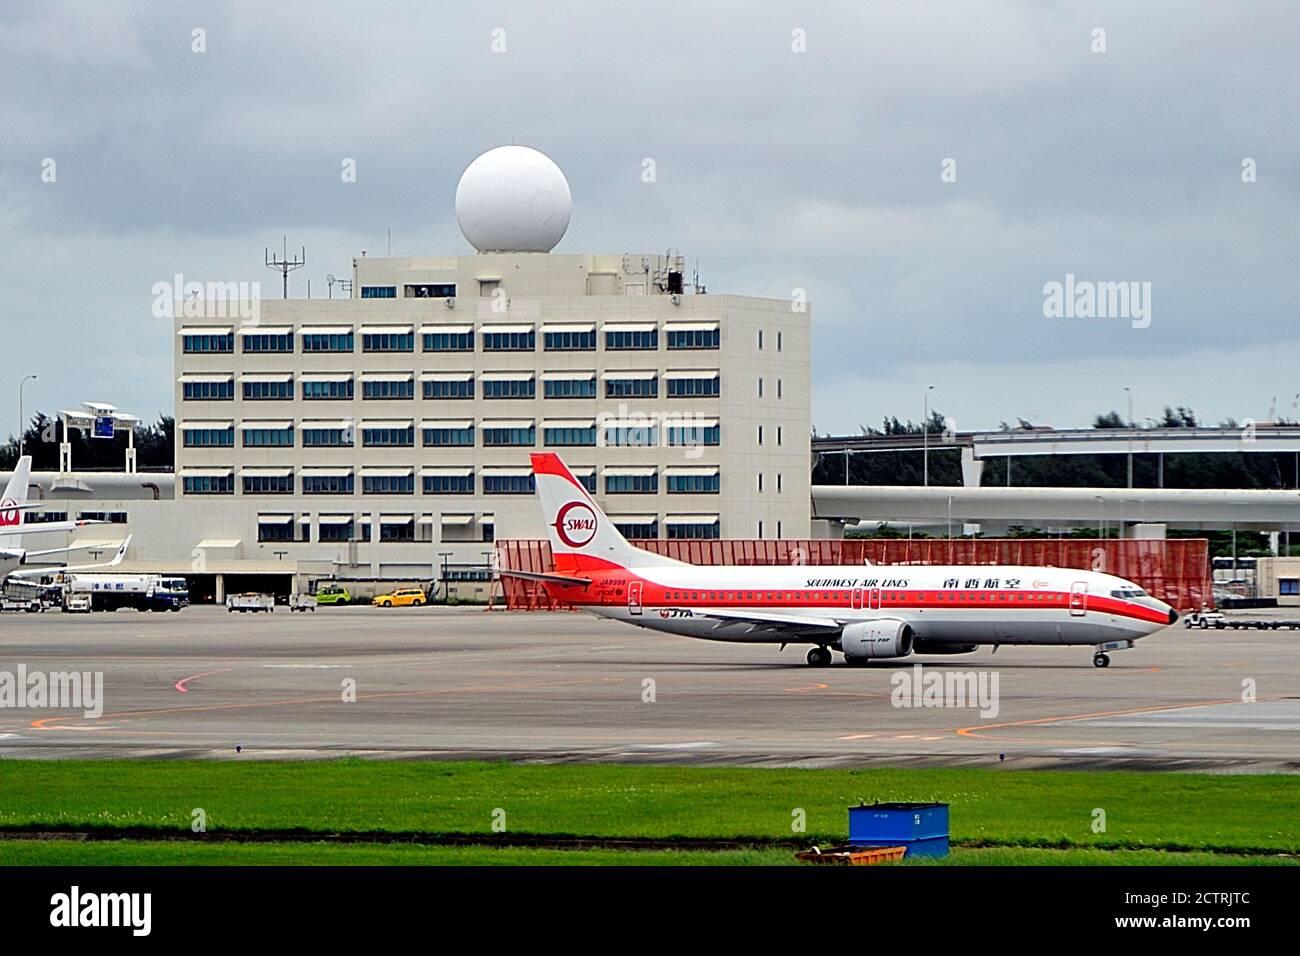 Japan Transocean Air, JTA, Boeing, B-737/400, JA8999, Southwest Air Lines Livery, Naha Airport, Okinawa, Ryukyu Islands, Japan Stock Photo